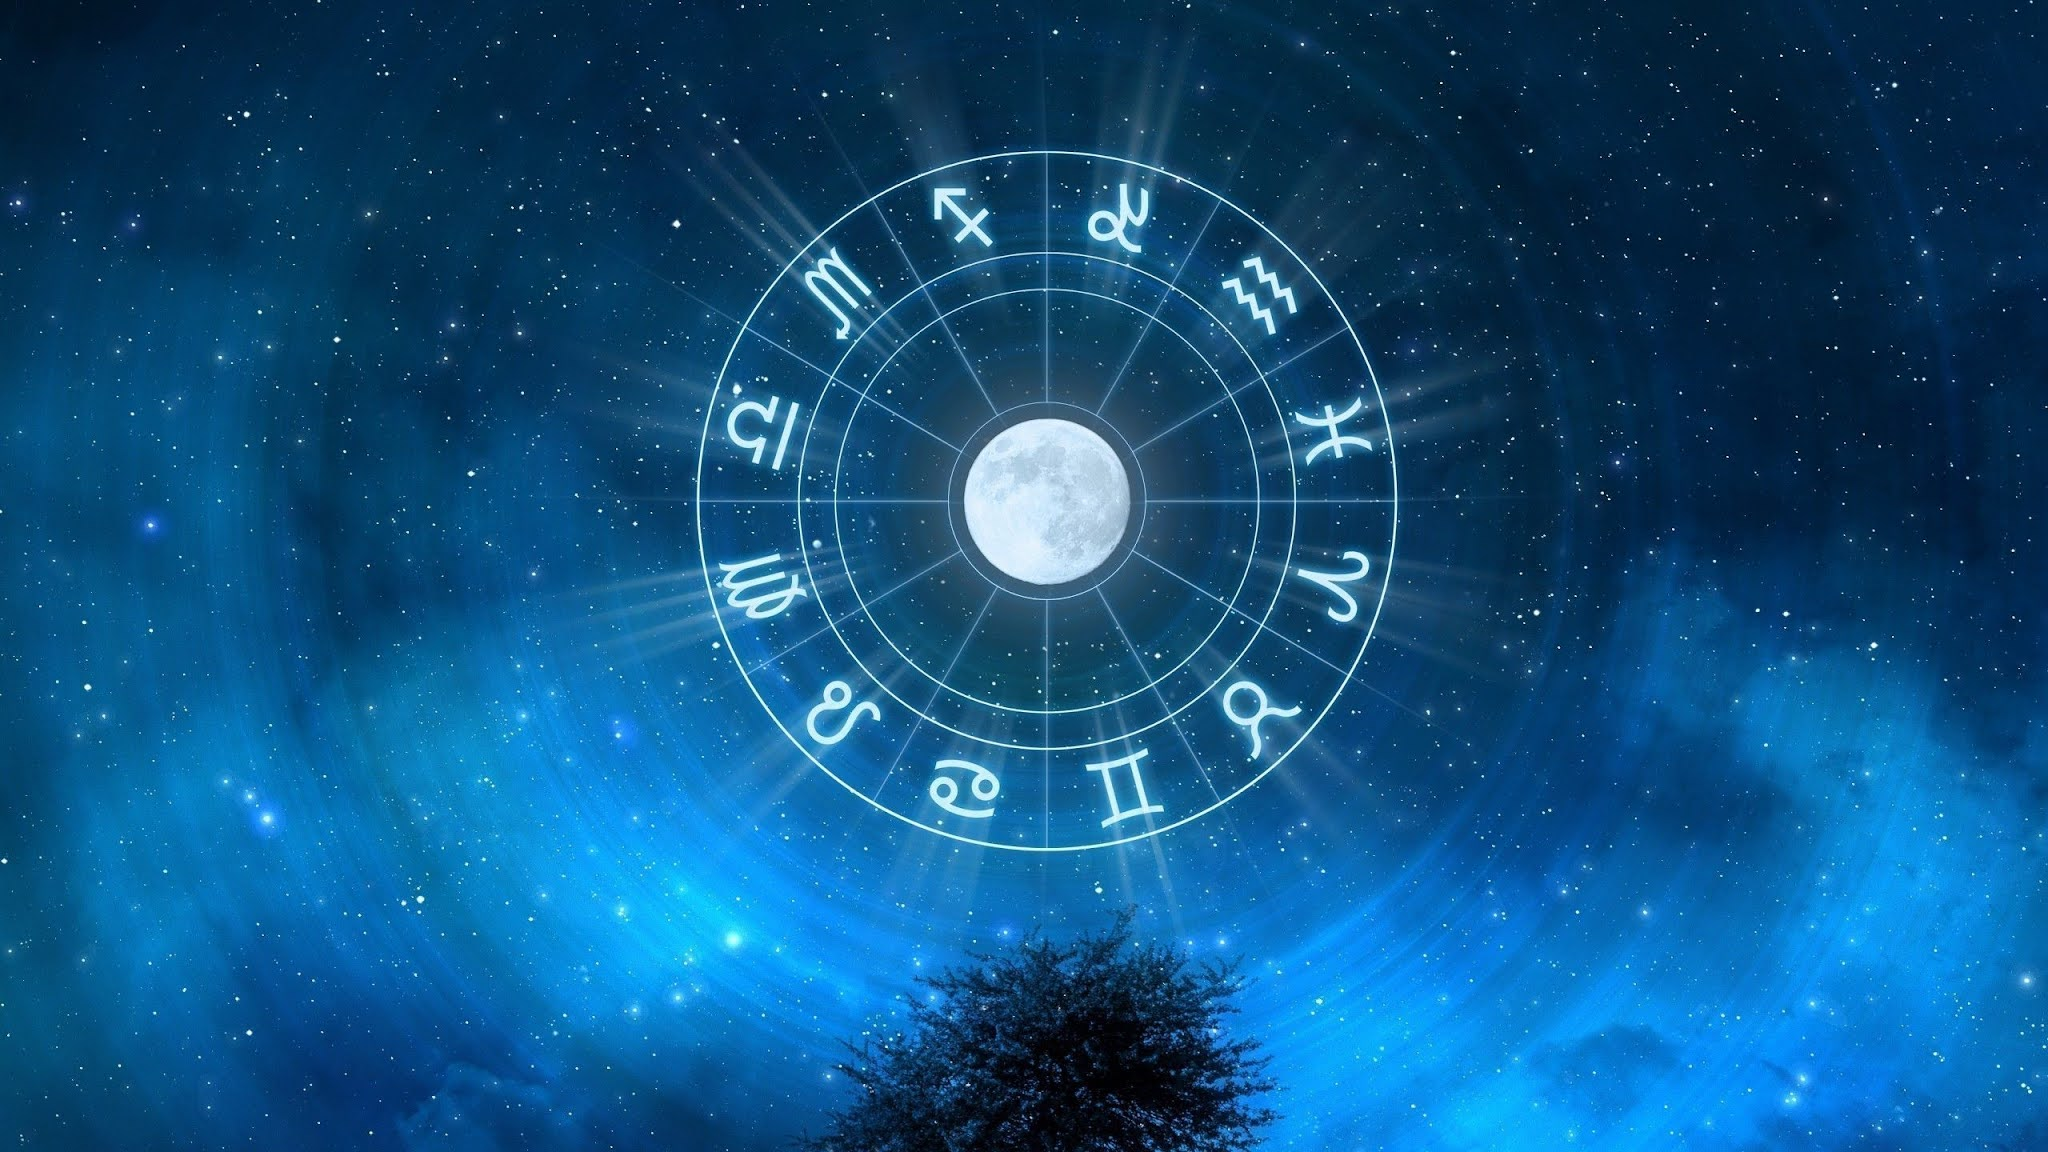 Simak! 5 Zodiak yang Terkenal Susah Bersosialisasi atau Introvert